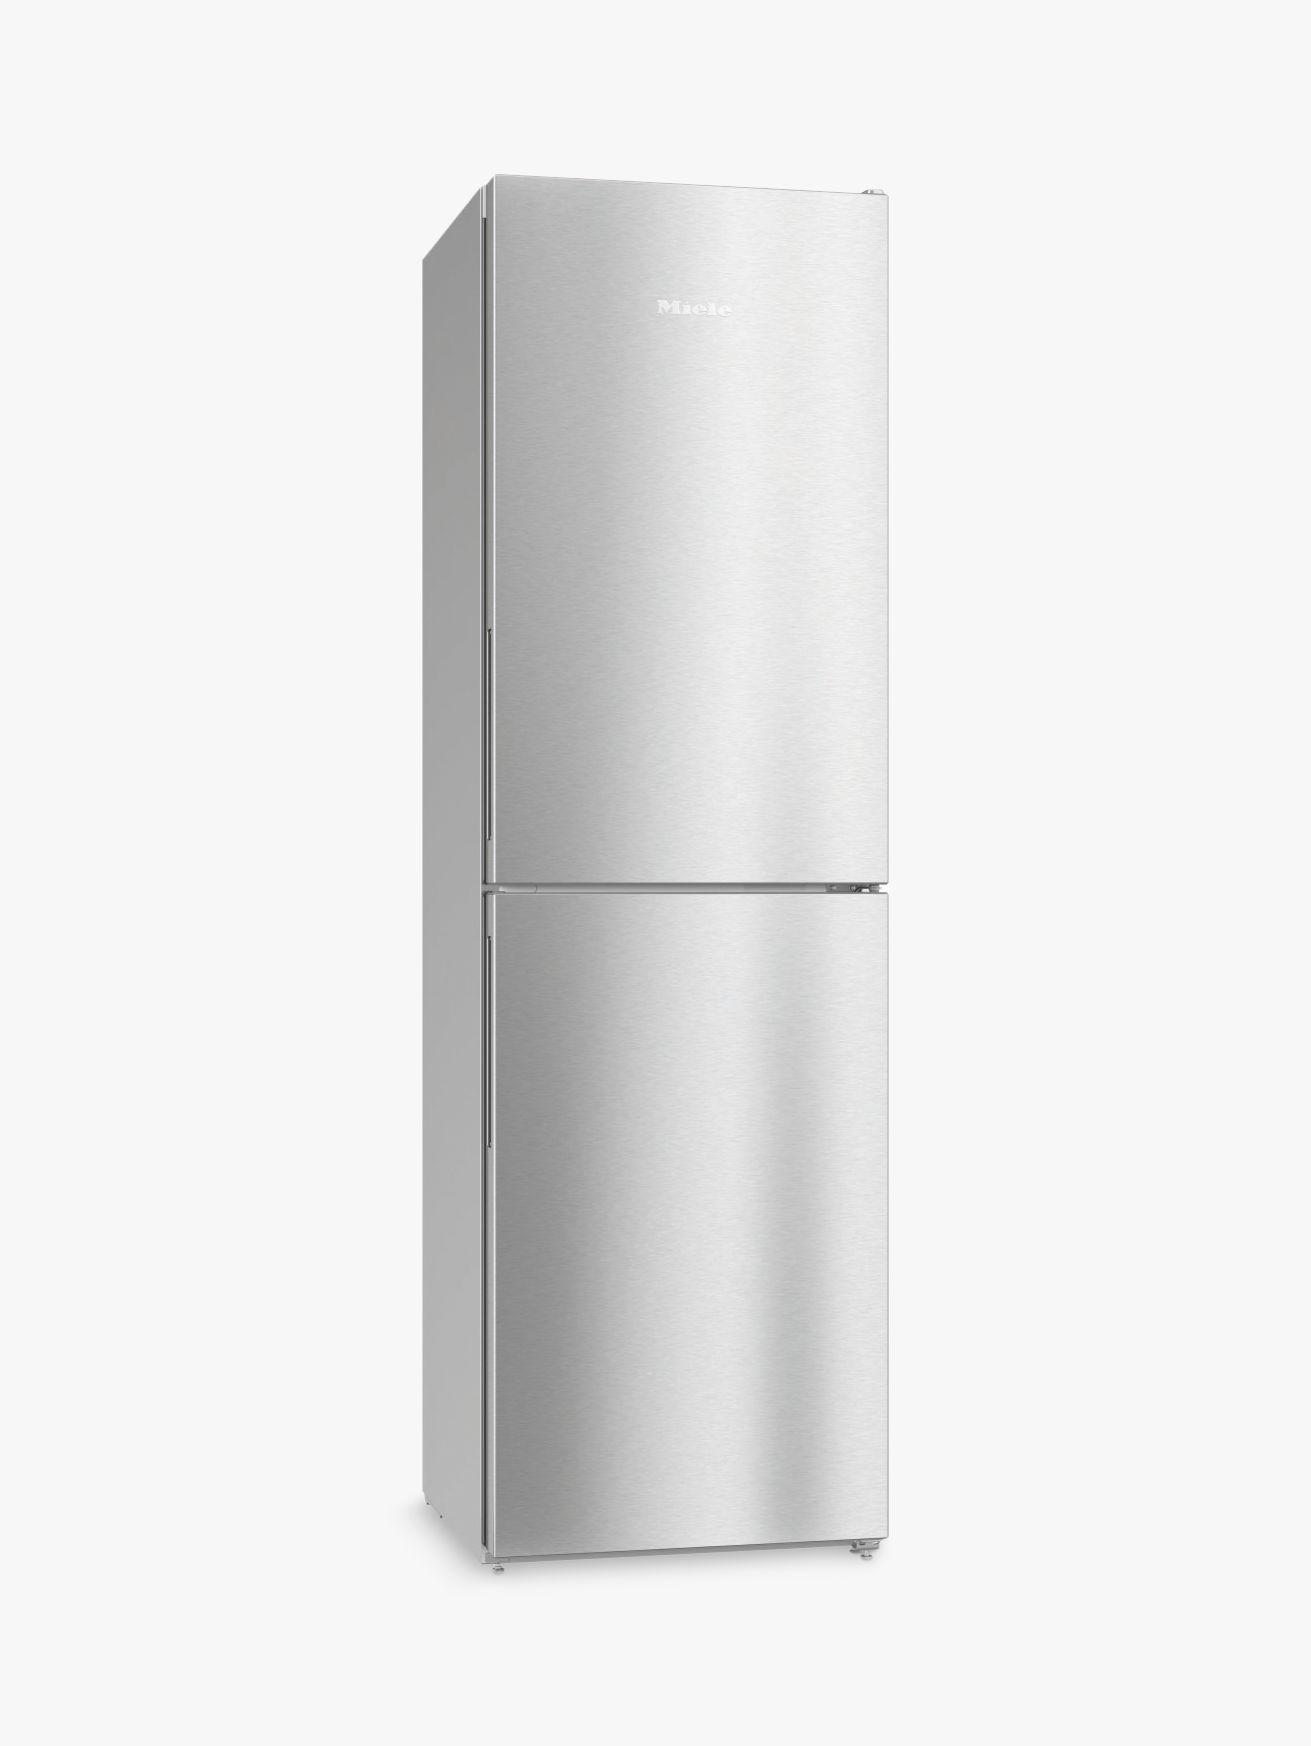 Miele Miele KFN29142D Freestanding Fridge Freezer, A++ Energy Rating, 60cm Wide, White